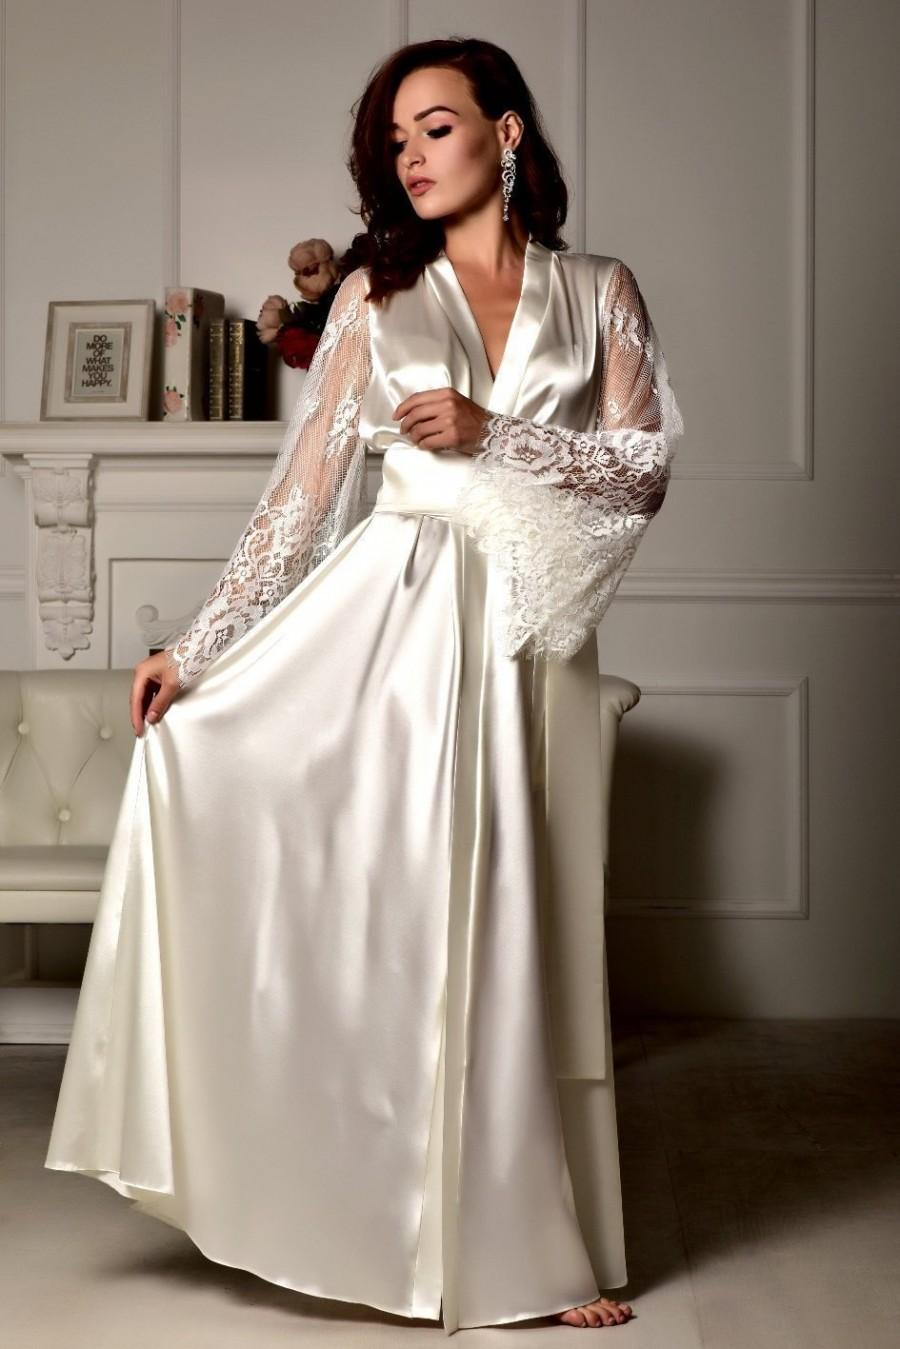 Mariage - Long lace bridal robe Wedding kimono Long bridal robe Kimono robe Bridal dressing gown Maxi robe Kimono long Bride robe Bridal kimono